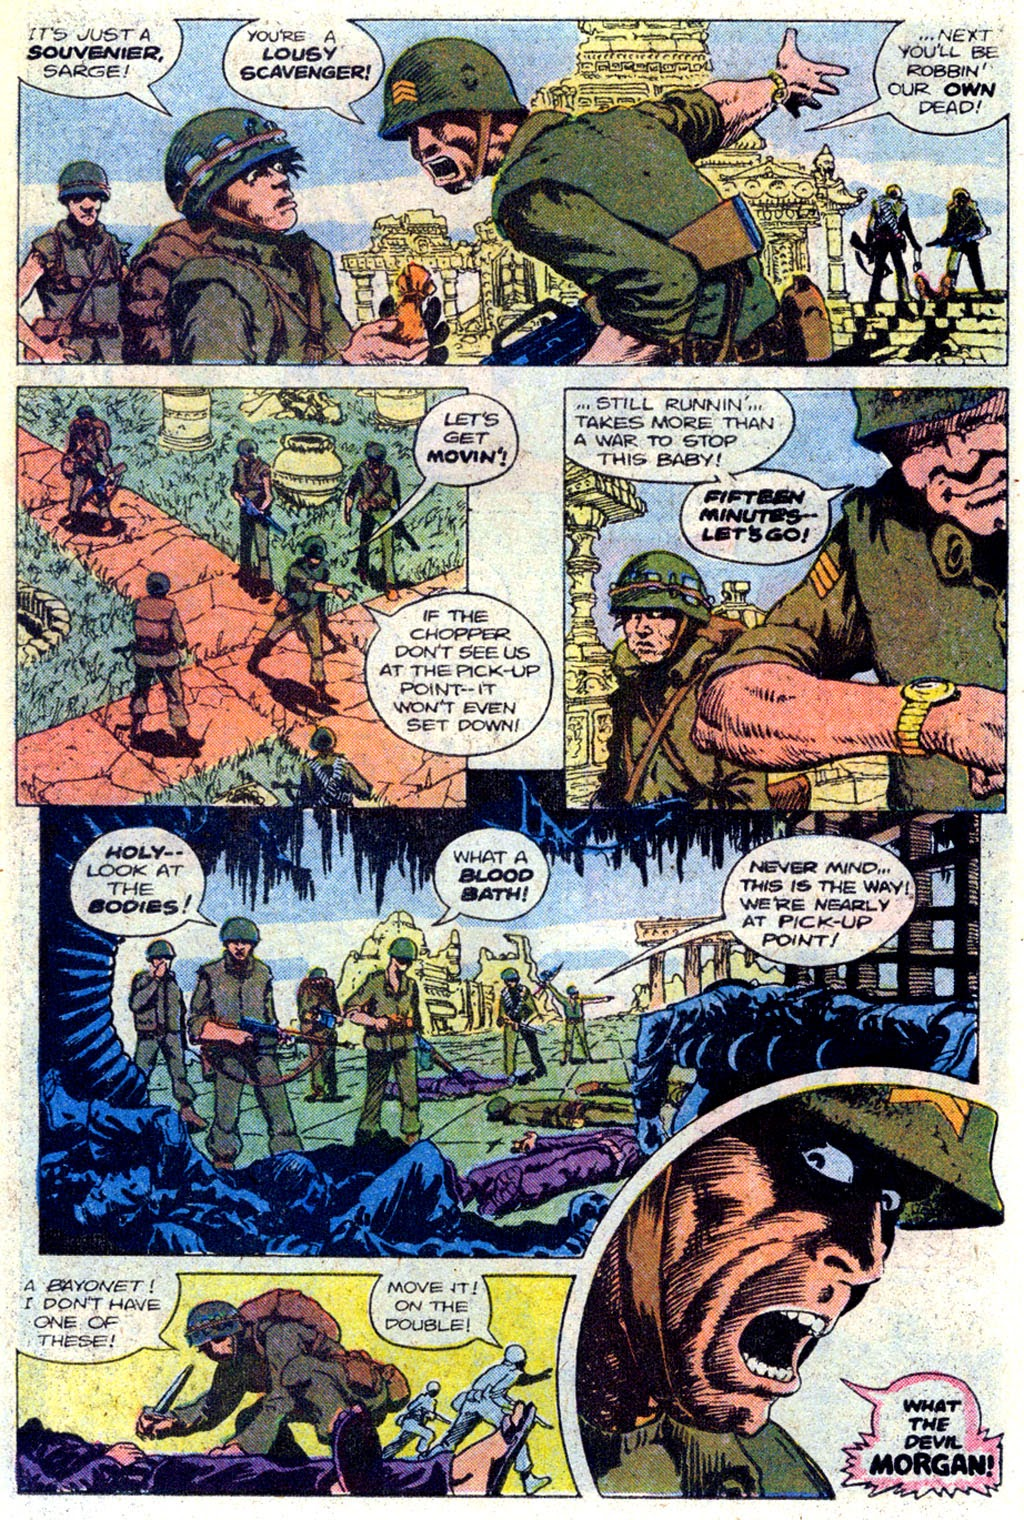 Read online Sgt. Rock comic -  Issue #339 - 16